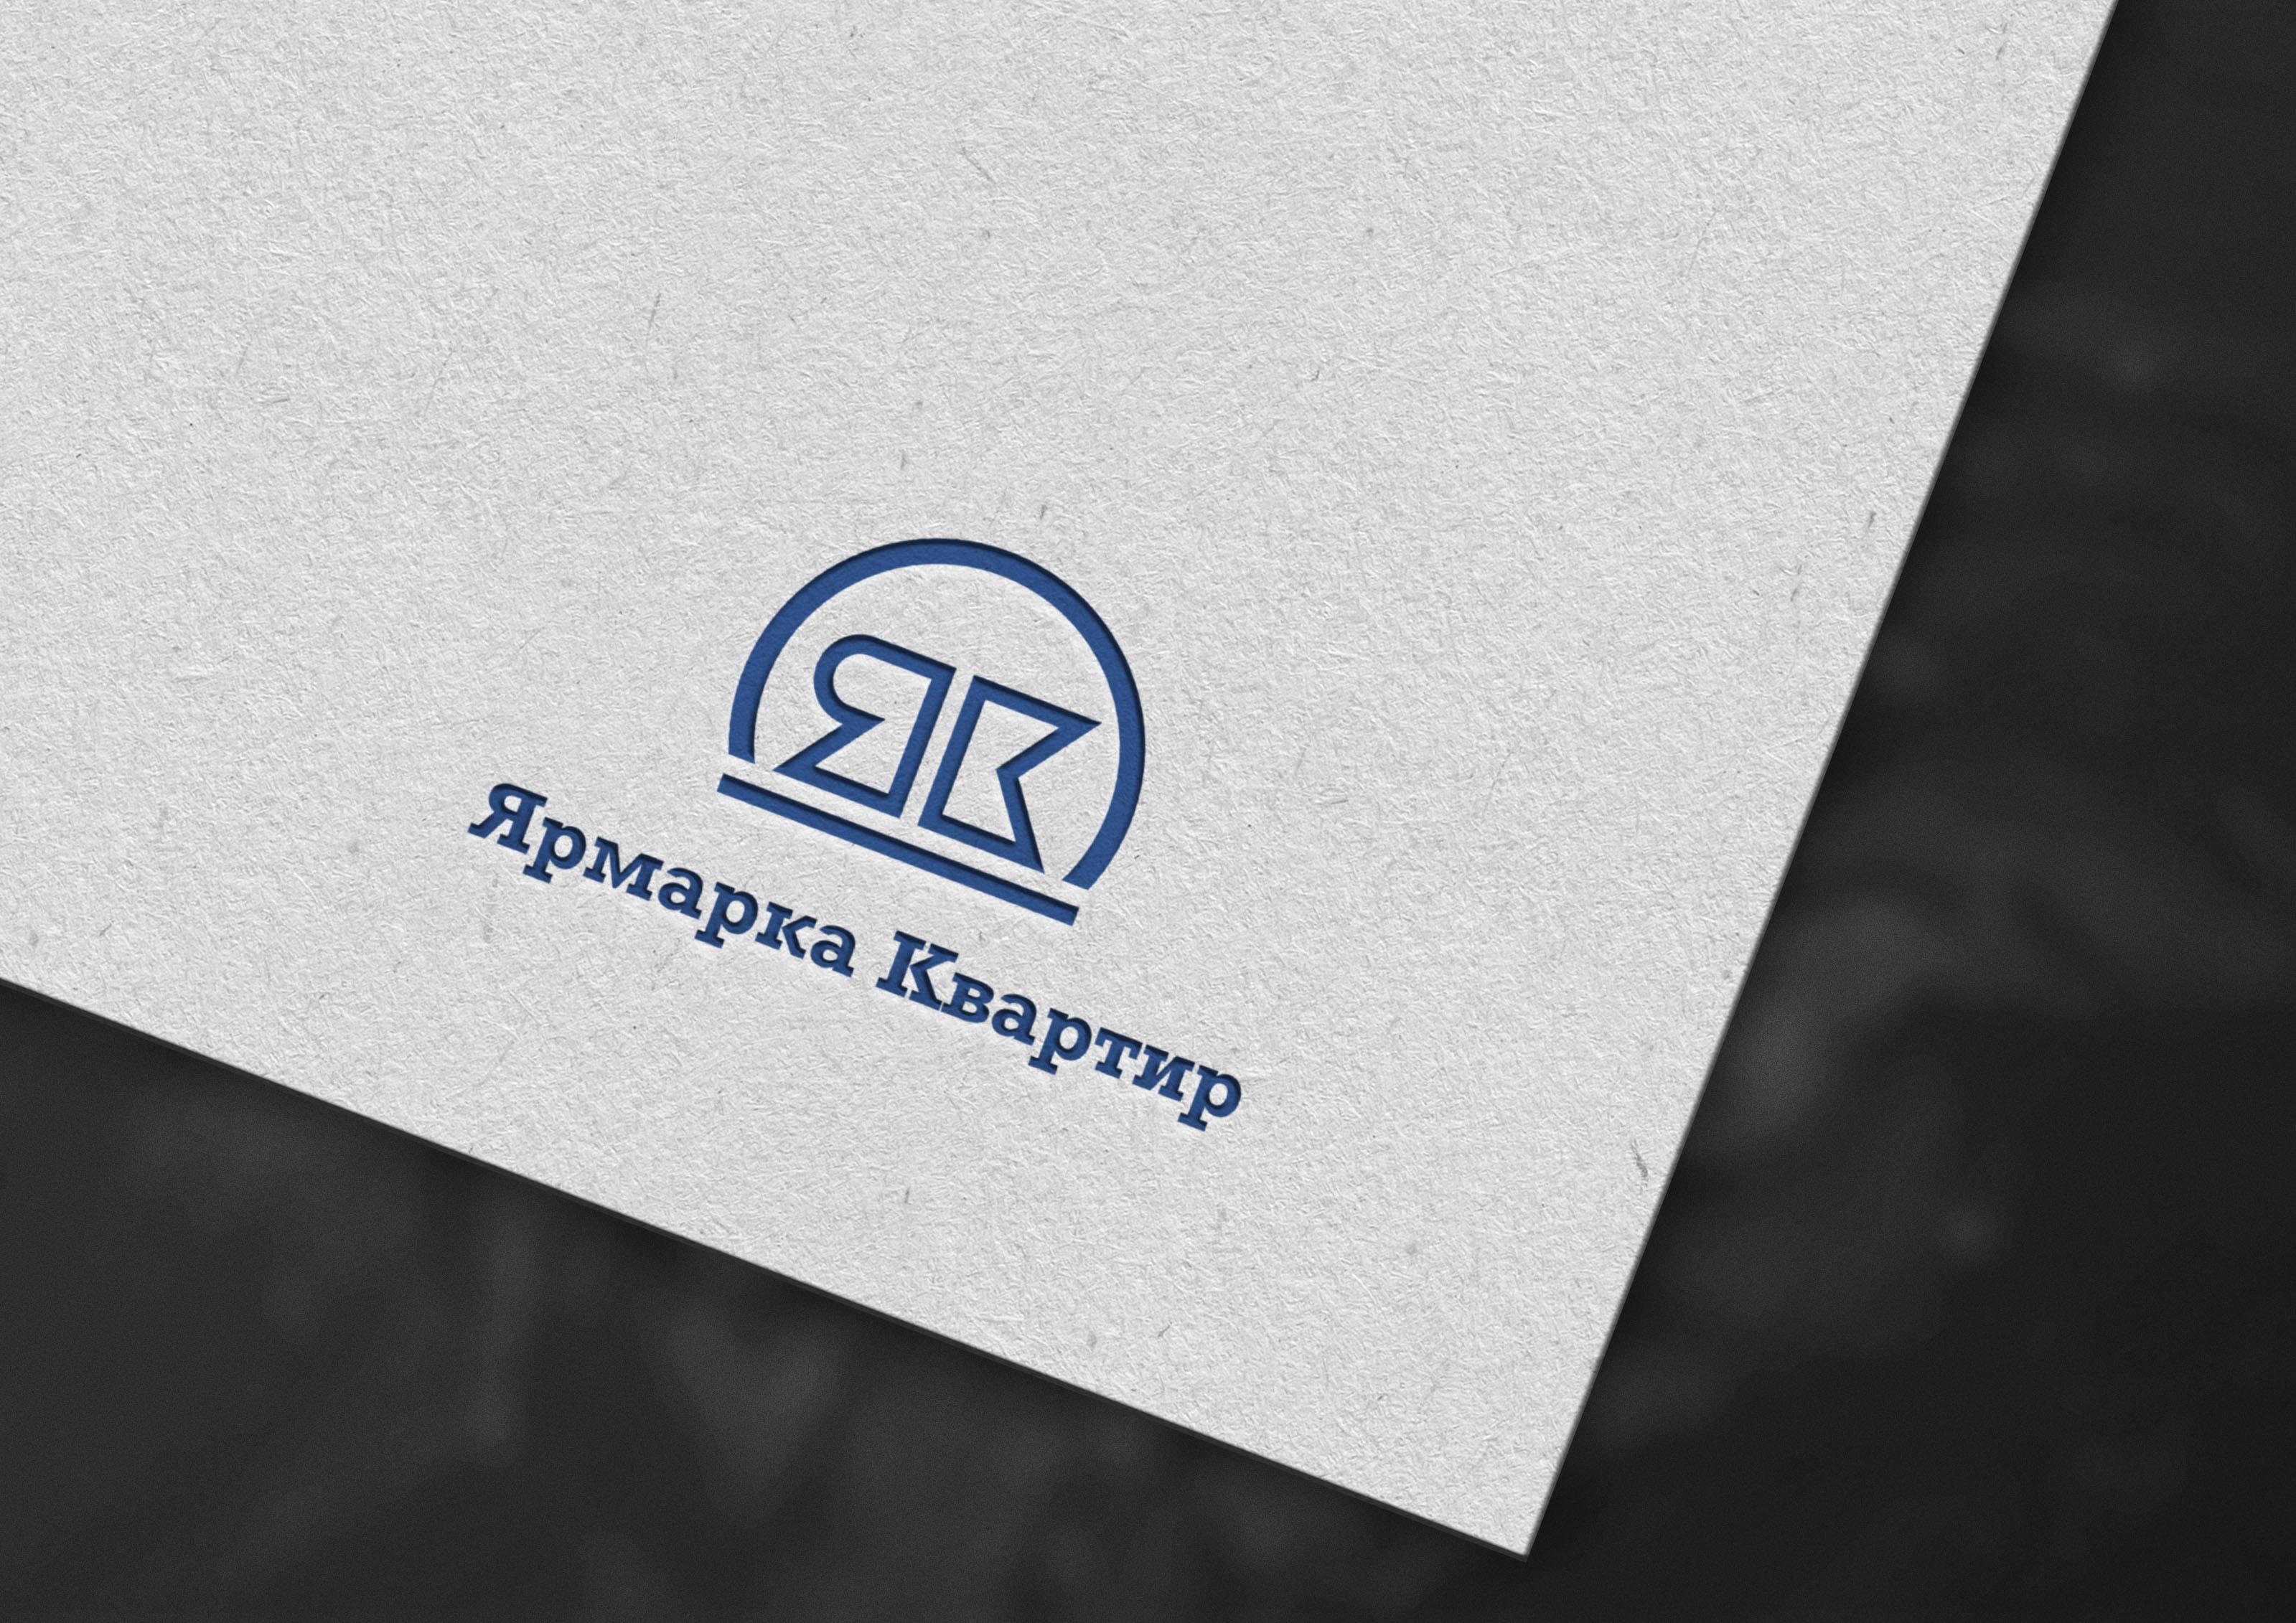 Создание логотипа, с вариантами для визитки и листовки фото f_179600a93fe20dc1.jpg